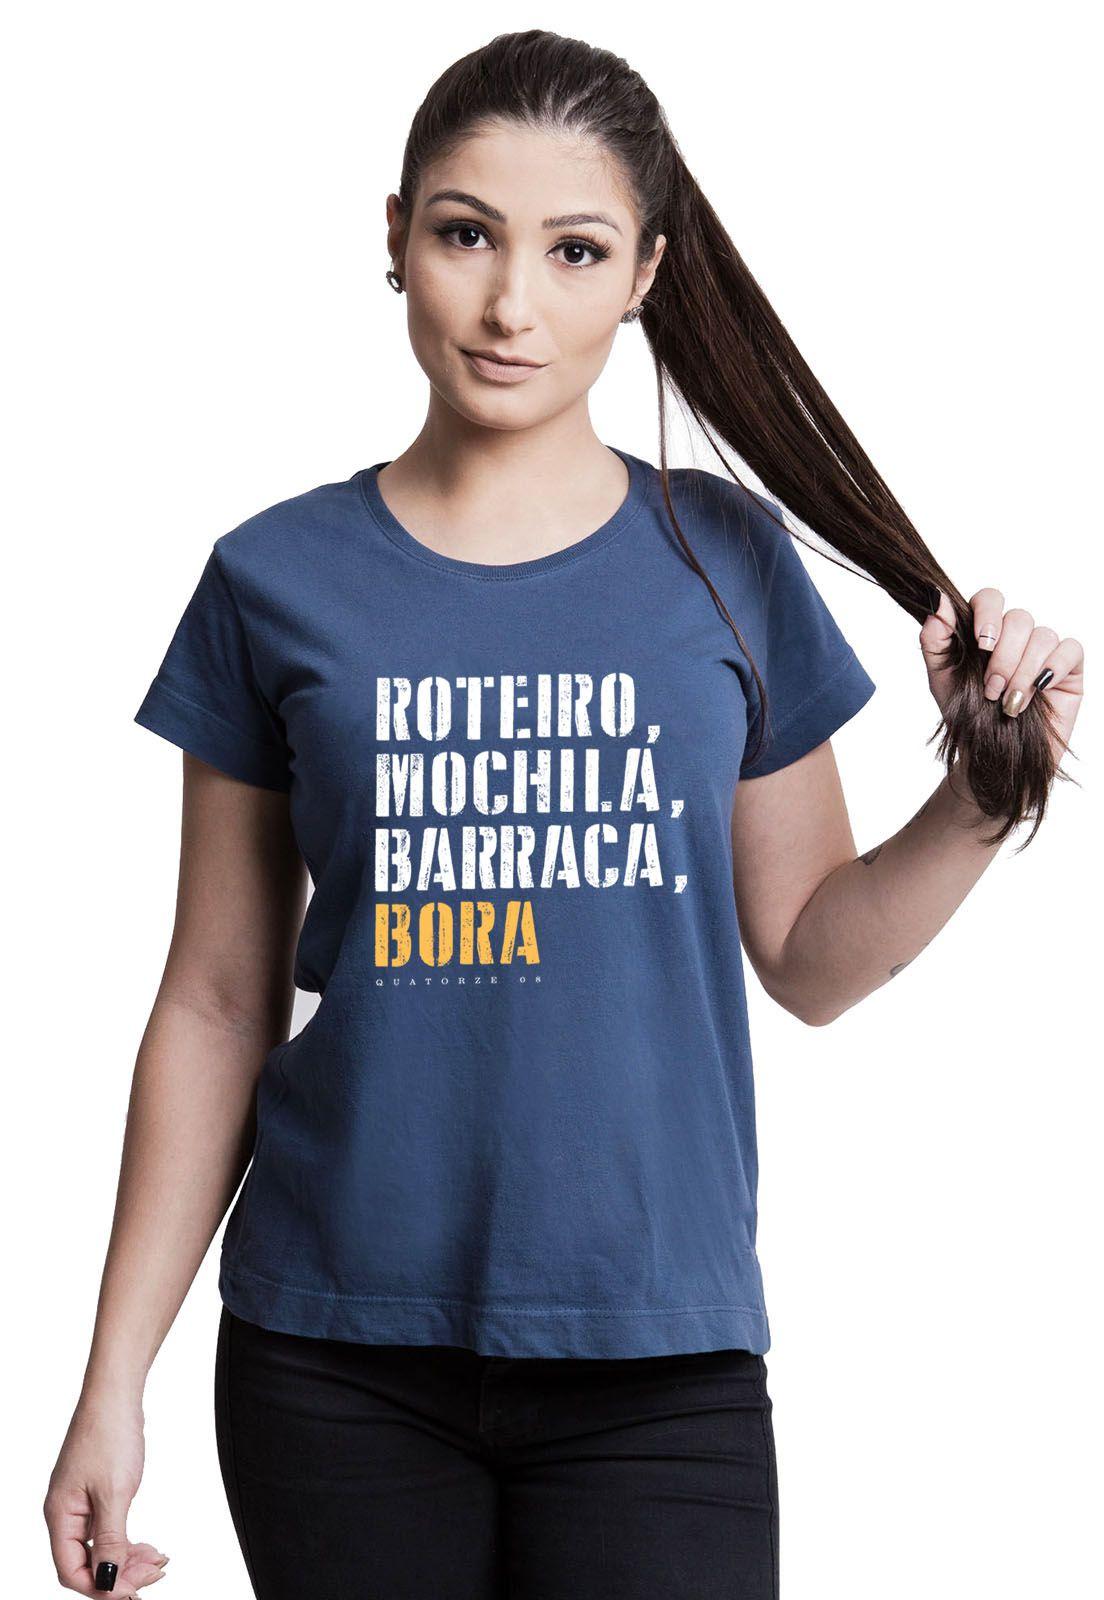 Camiseta Feminina Barraca e Bora Azul Marinho